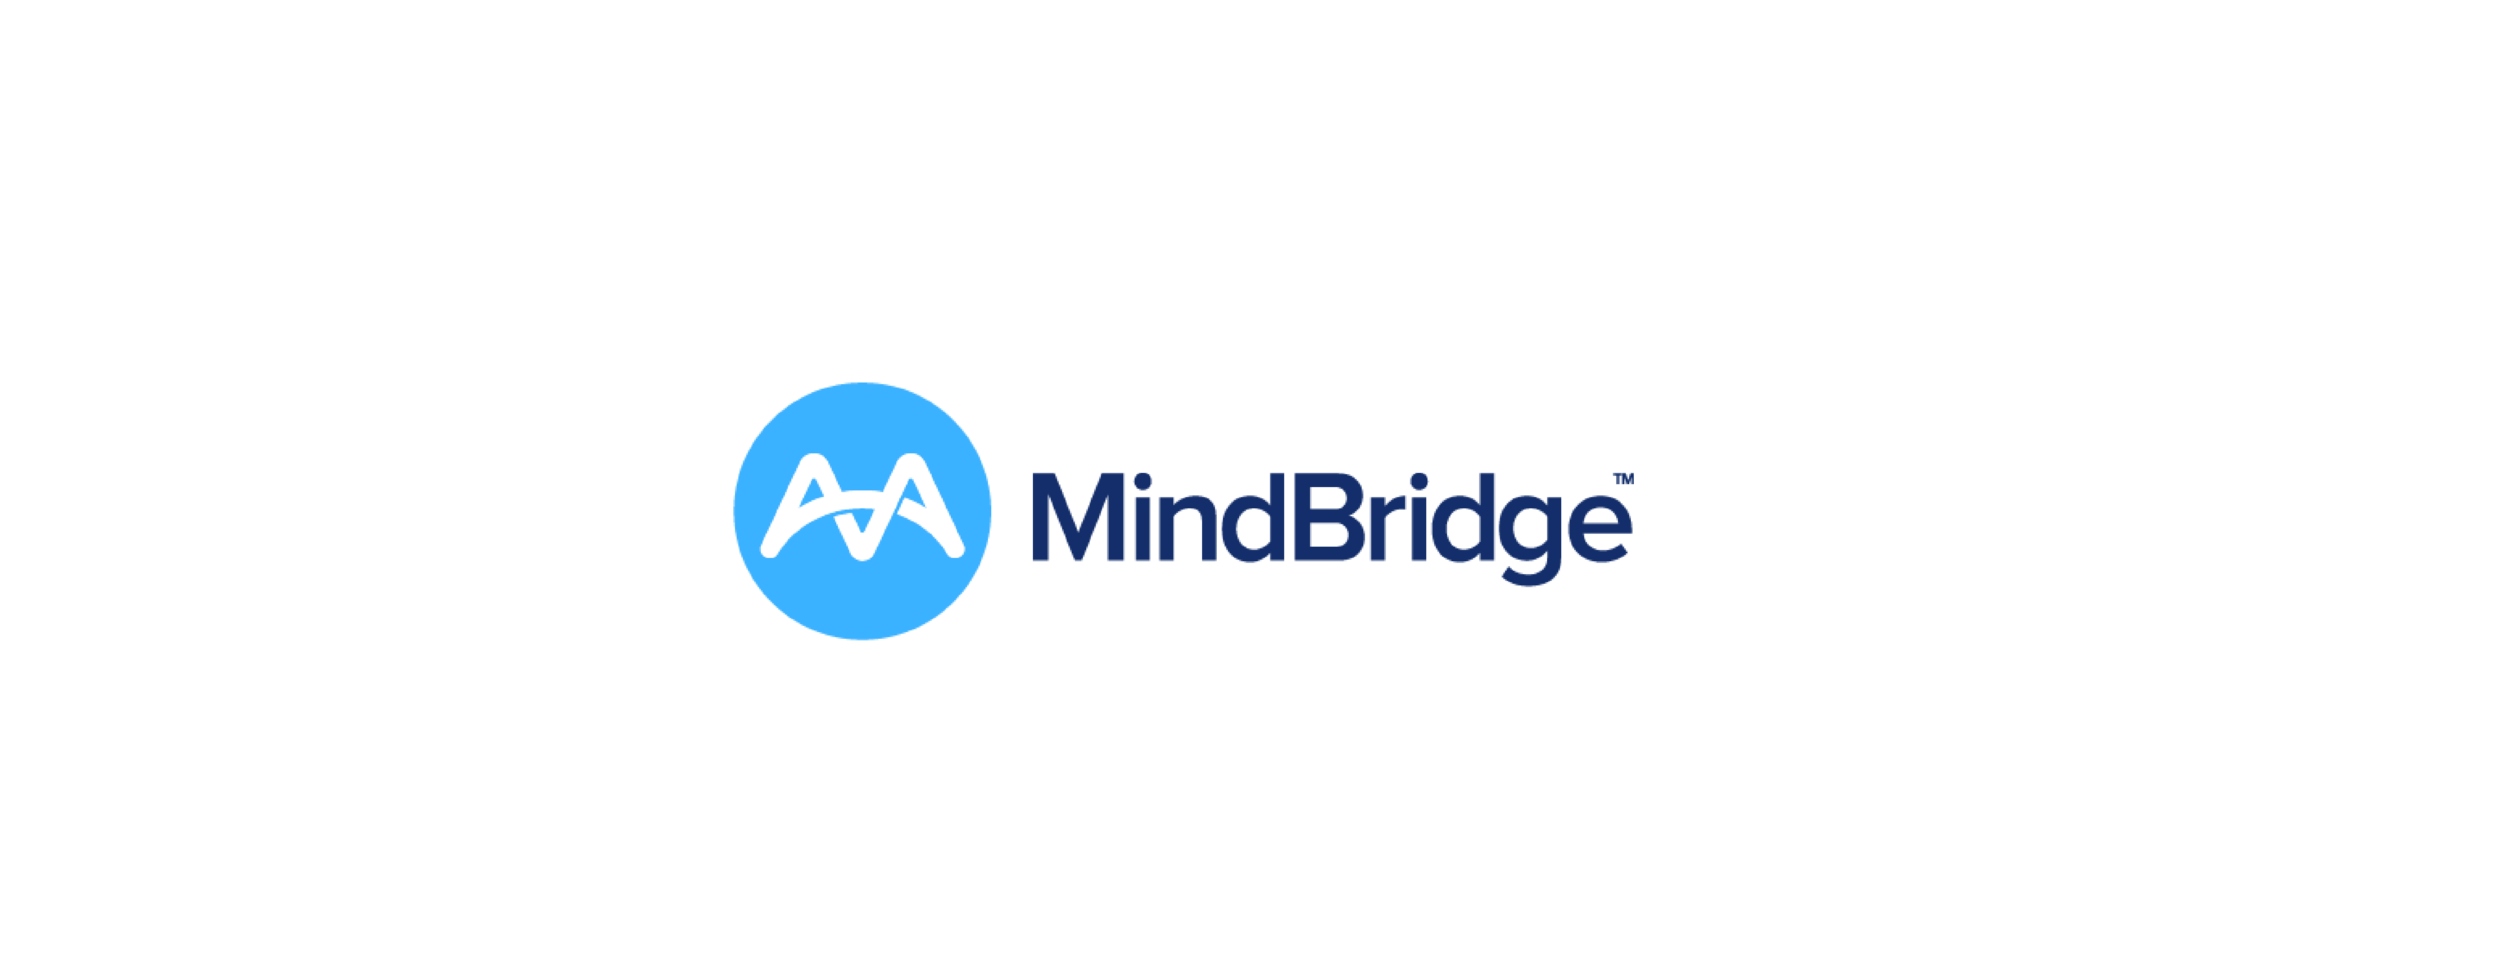 mindbridge-01.png